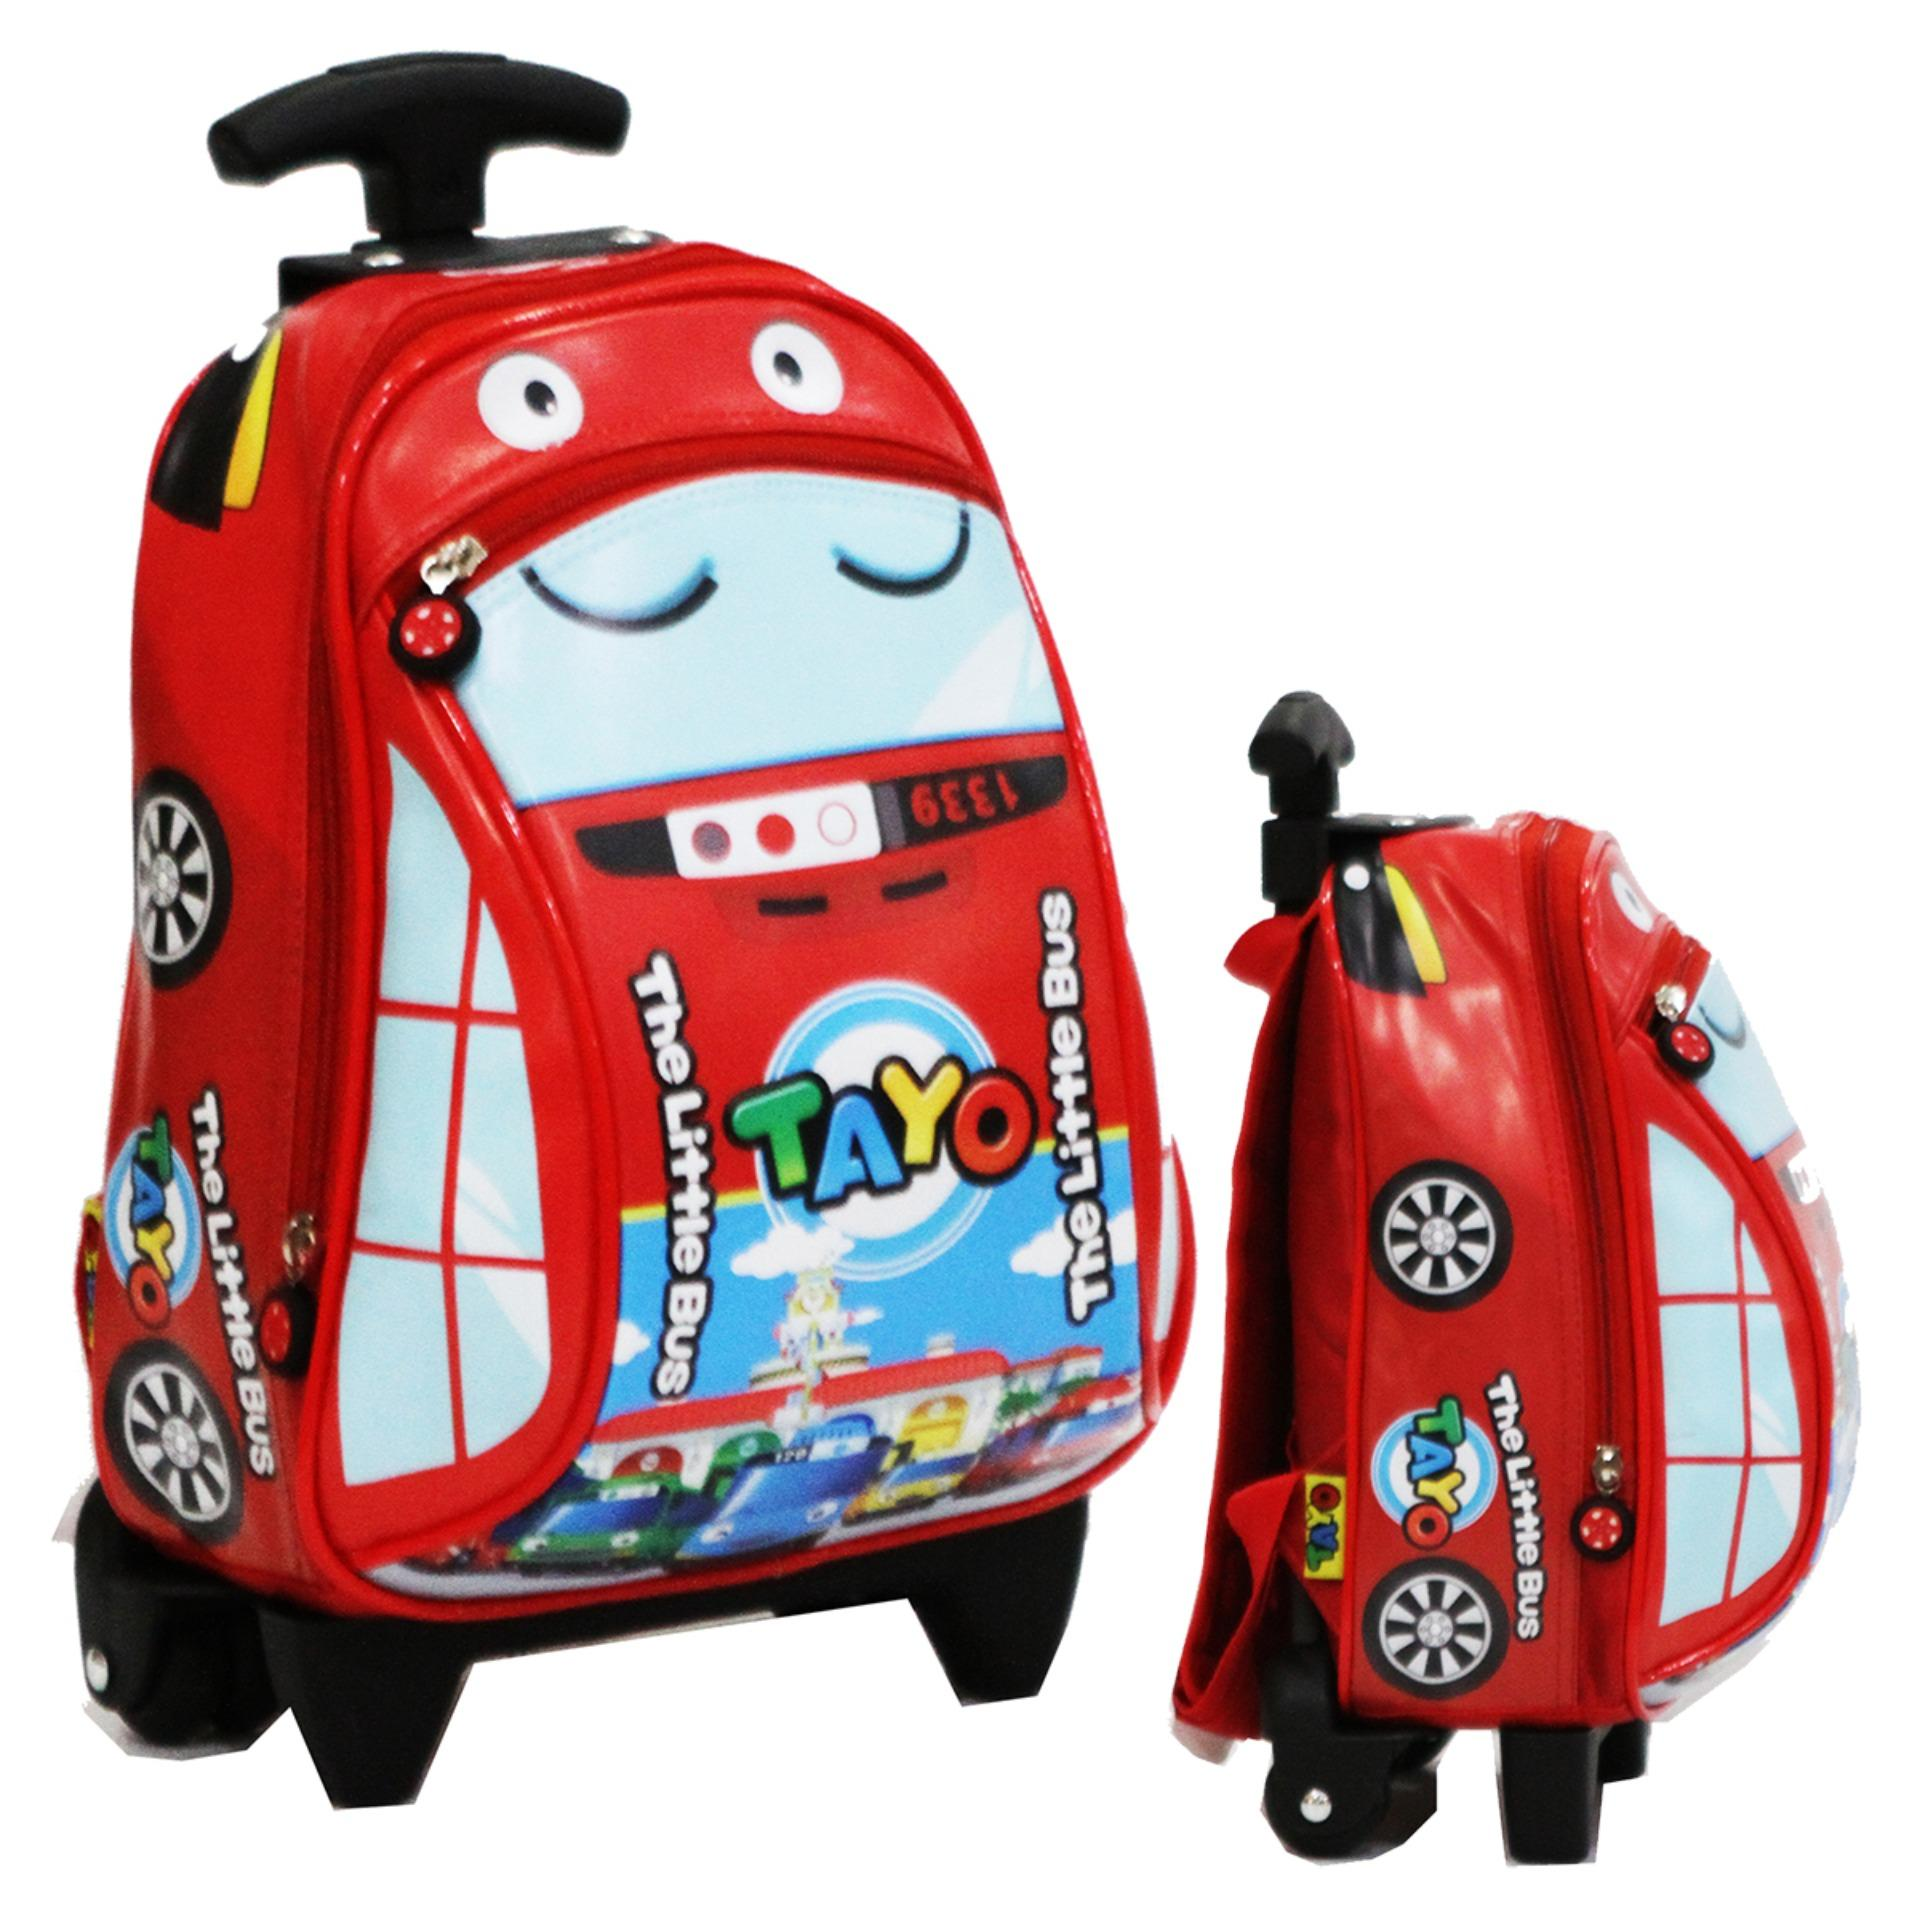 Onlan Tas Trolley Anak Sekolah PAUT Motif Karakter Anak The Little Bus Tayo Bahan  Kain Sponge affccd2209